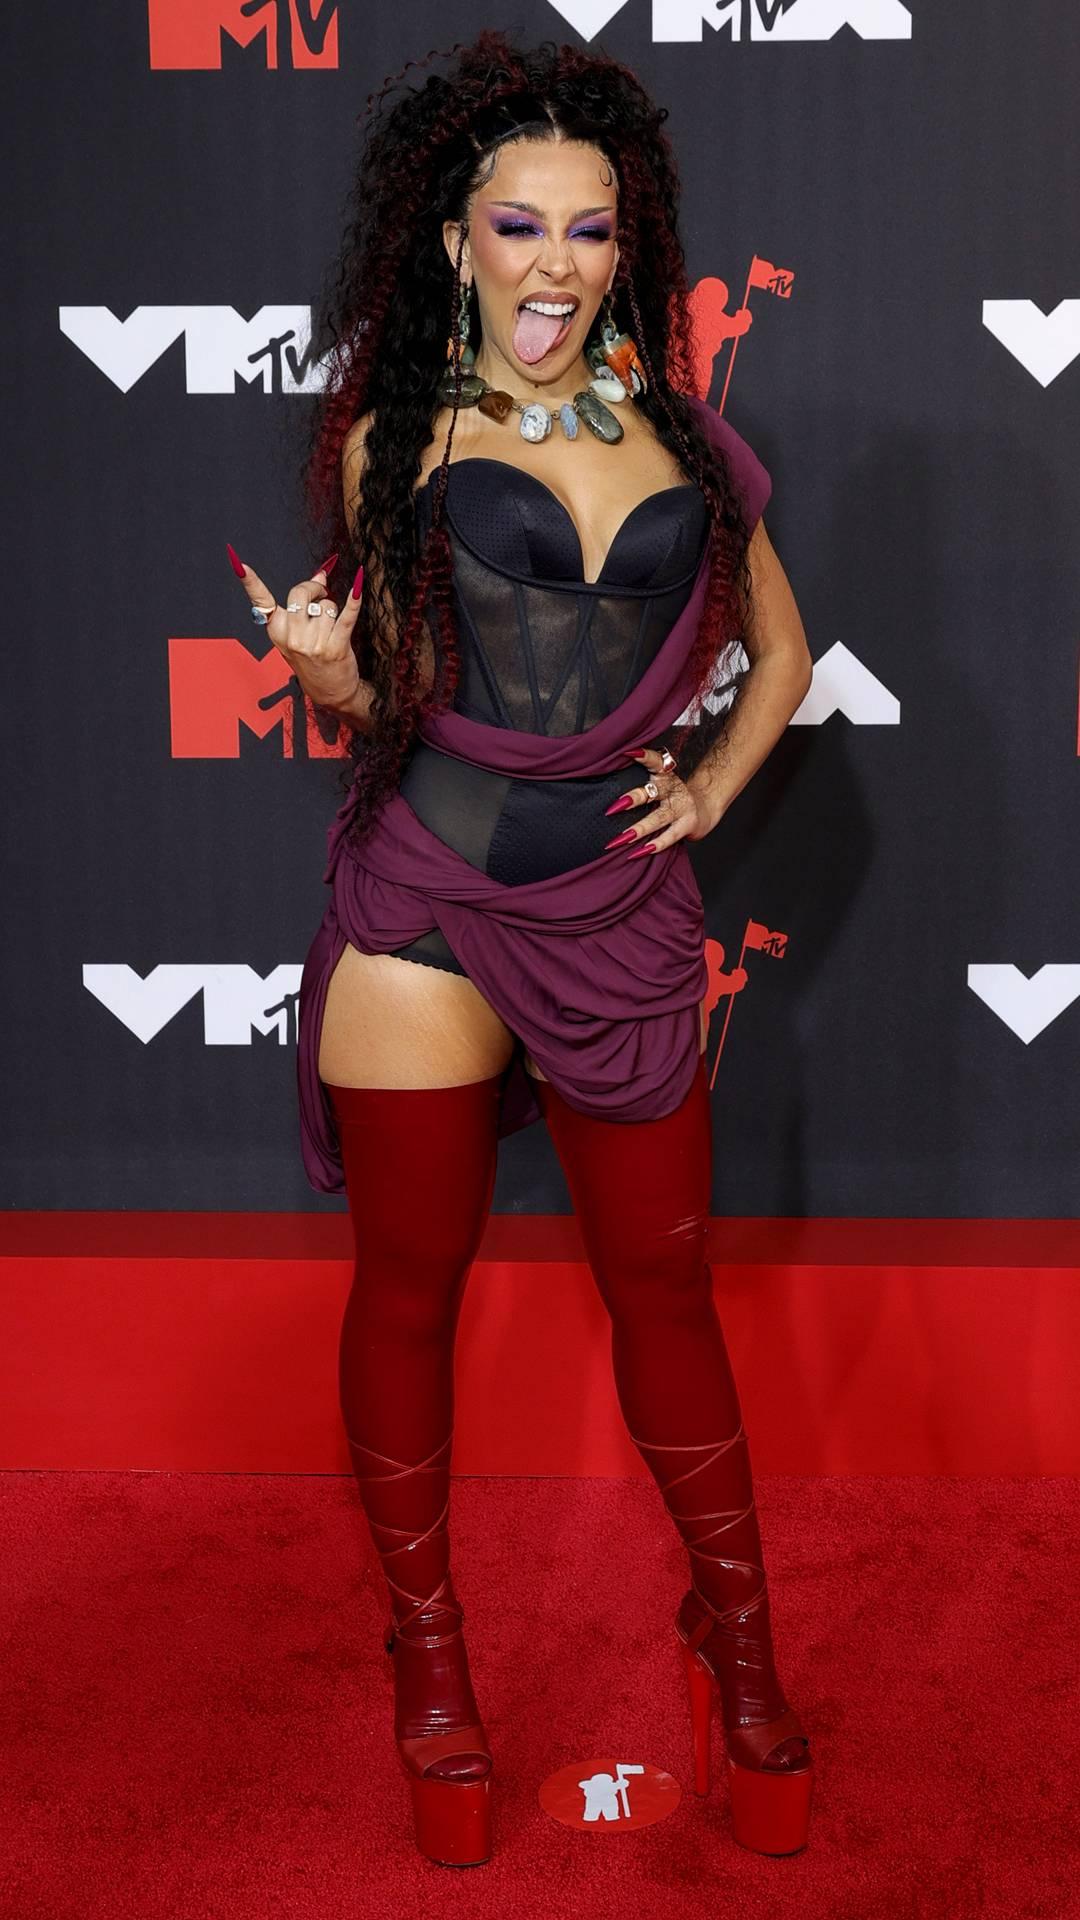 MTV Video Music Awards 2021 | The Best of the VMAs 2021 Red Carpet | Doja Cat | 1080x1920